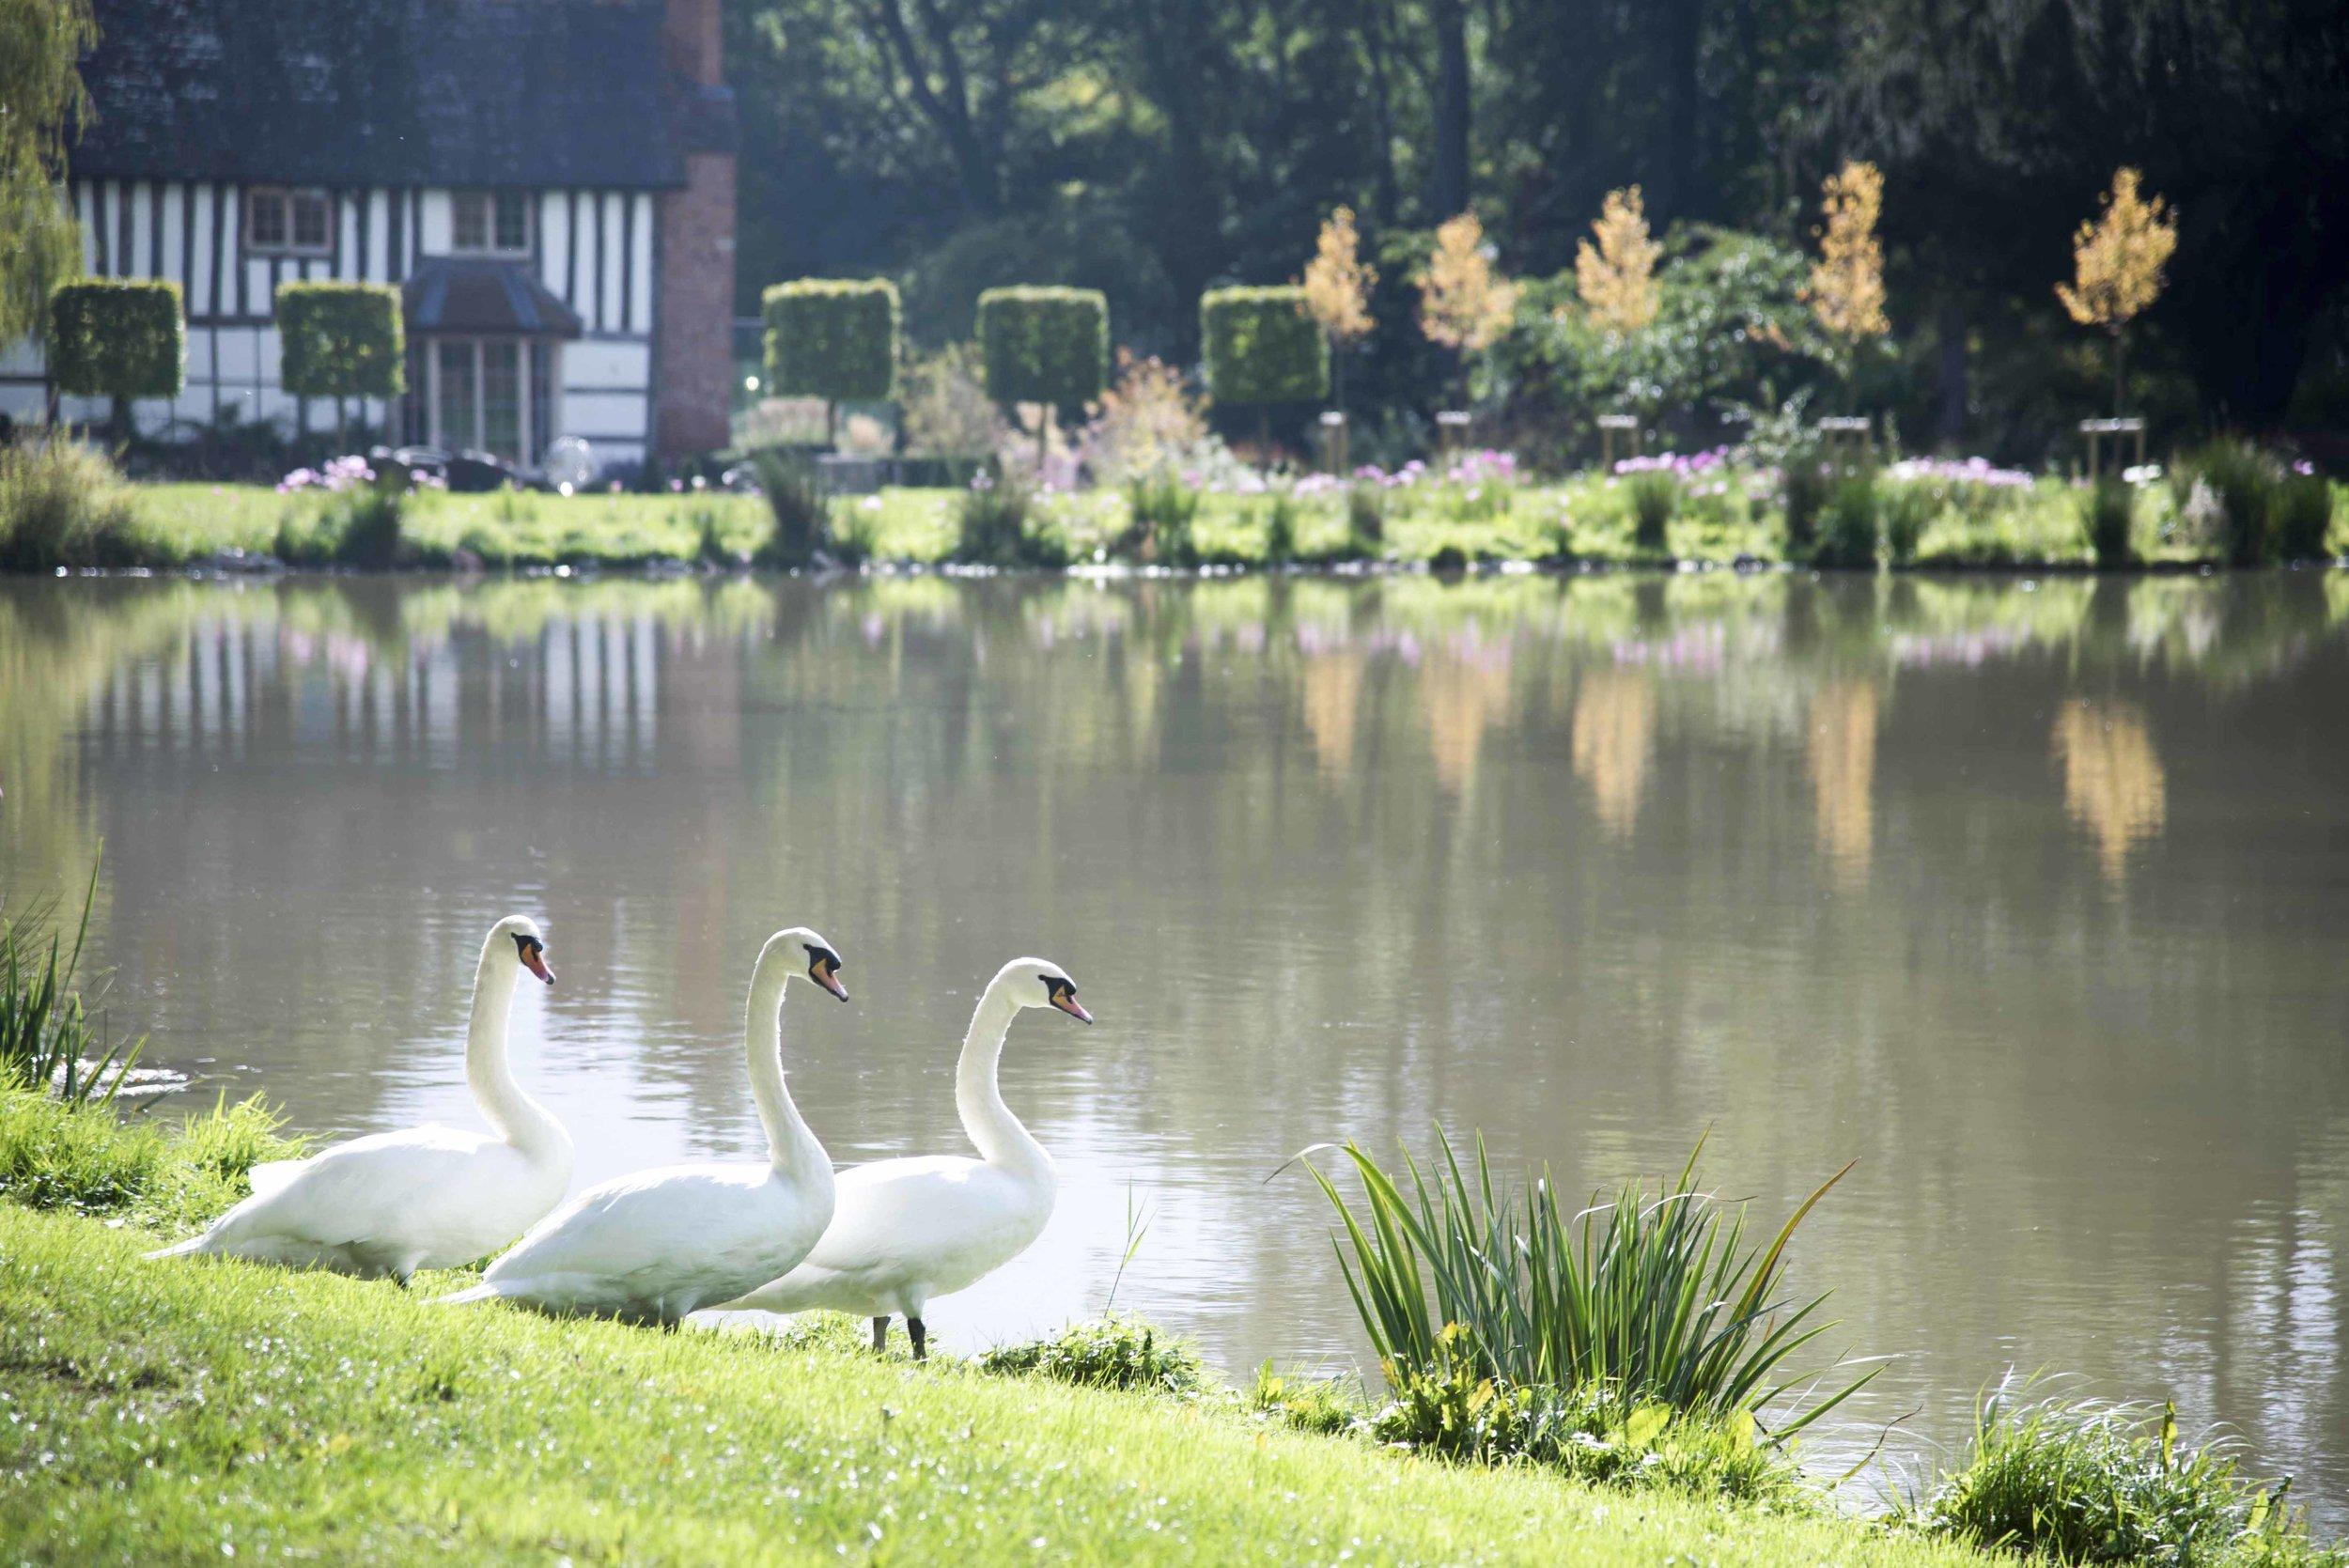 Three Swans standing by lake.jpg